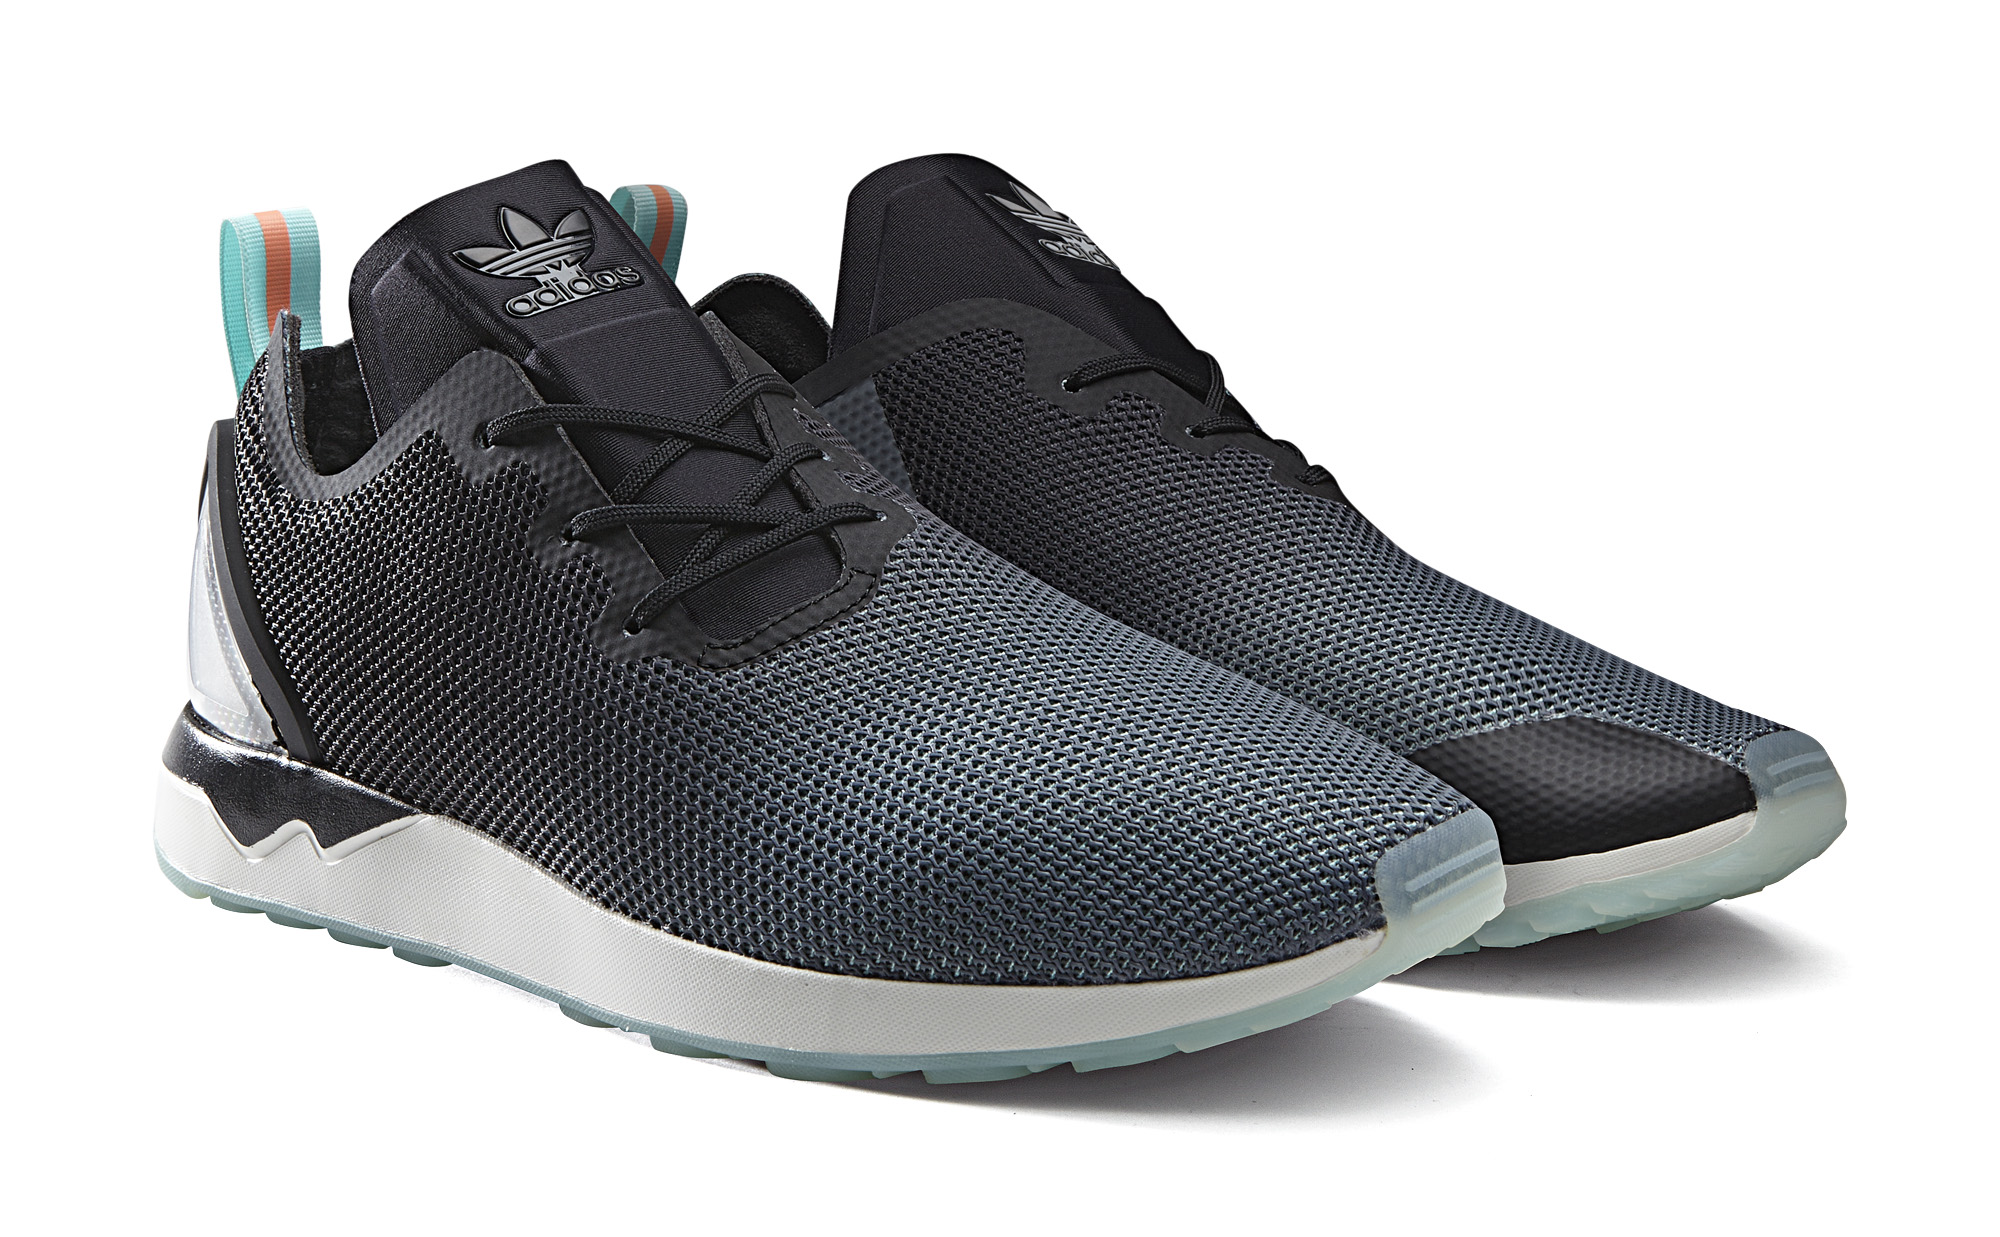 Adidas Zx Flux 2016